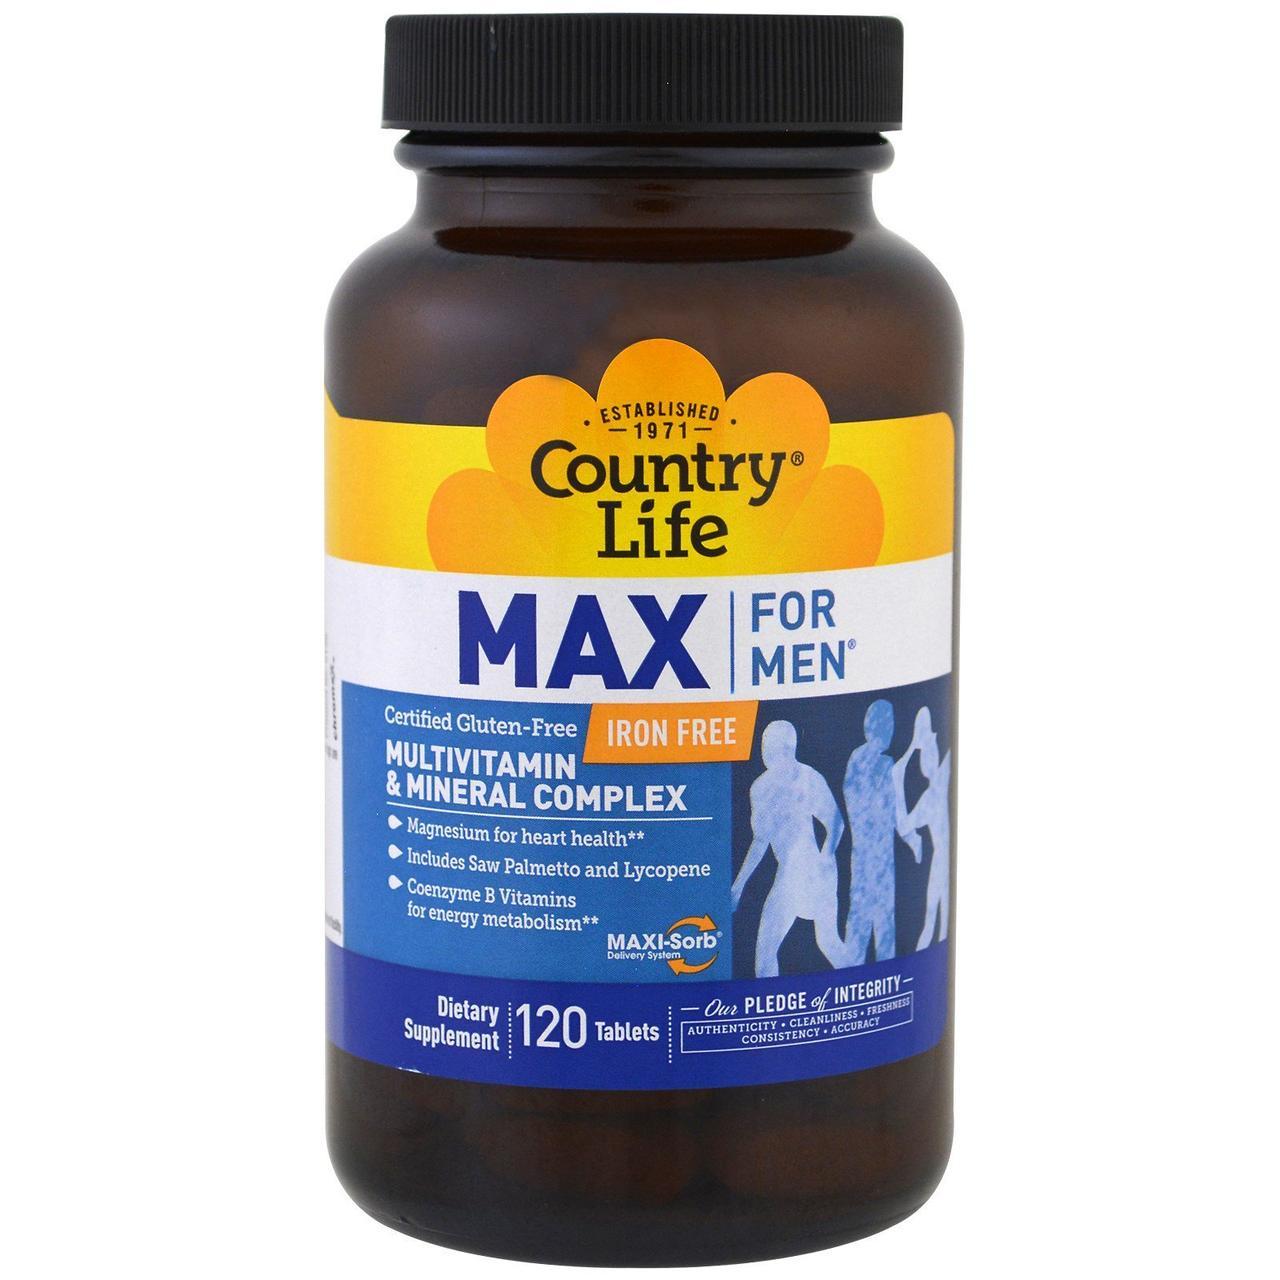 Репродуктивное здоровье мужчин, Max for Men, Country Life, 120 табл.